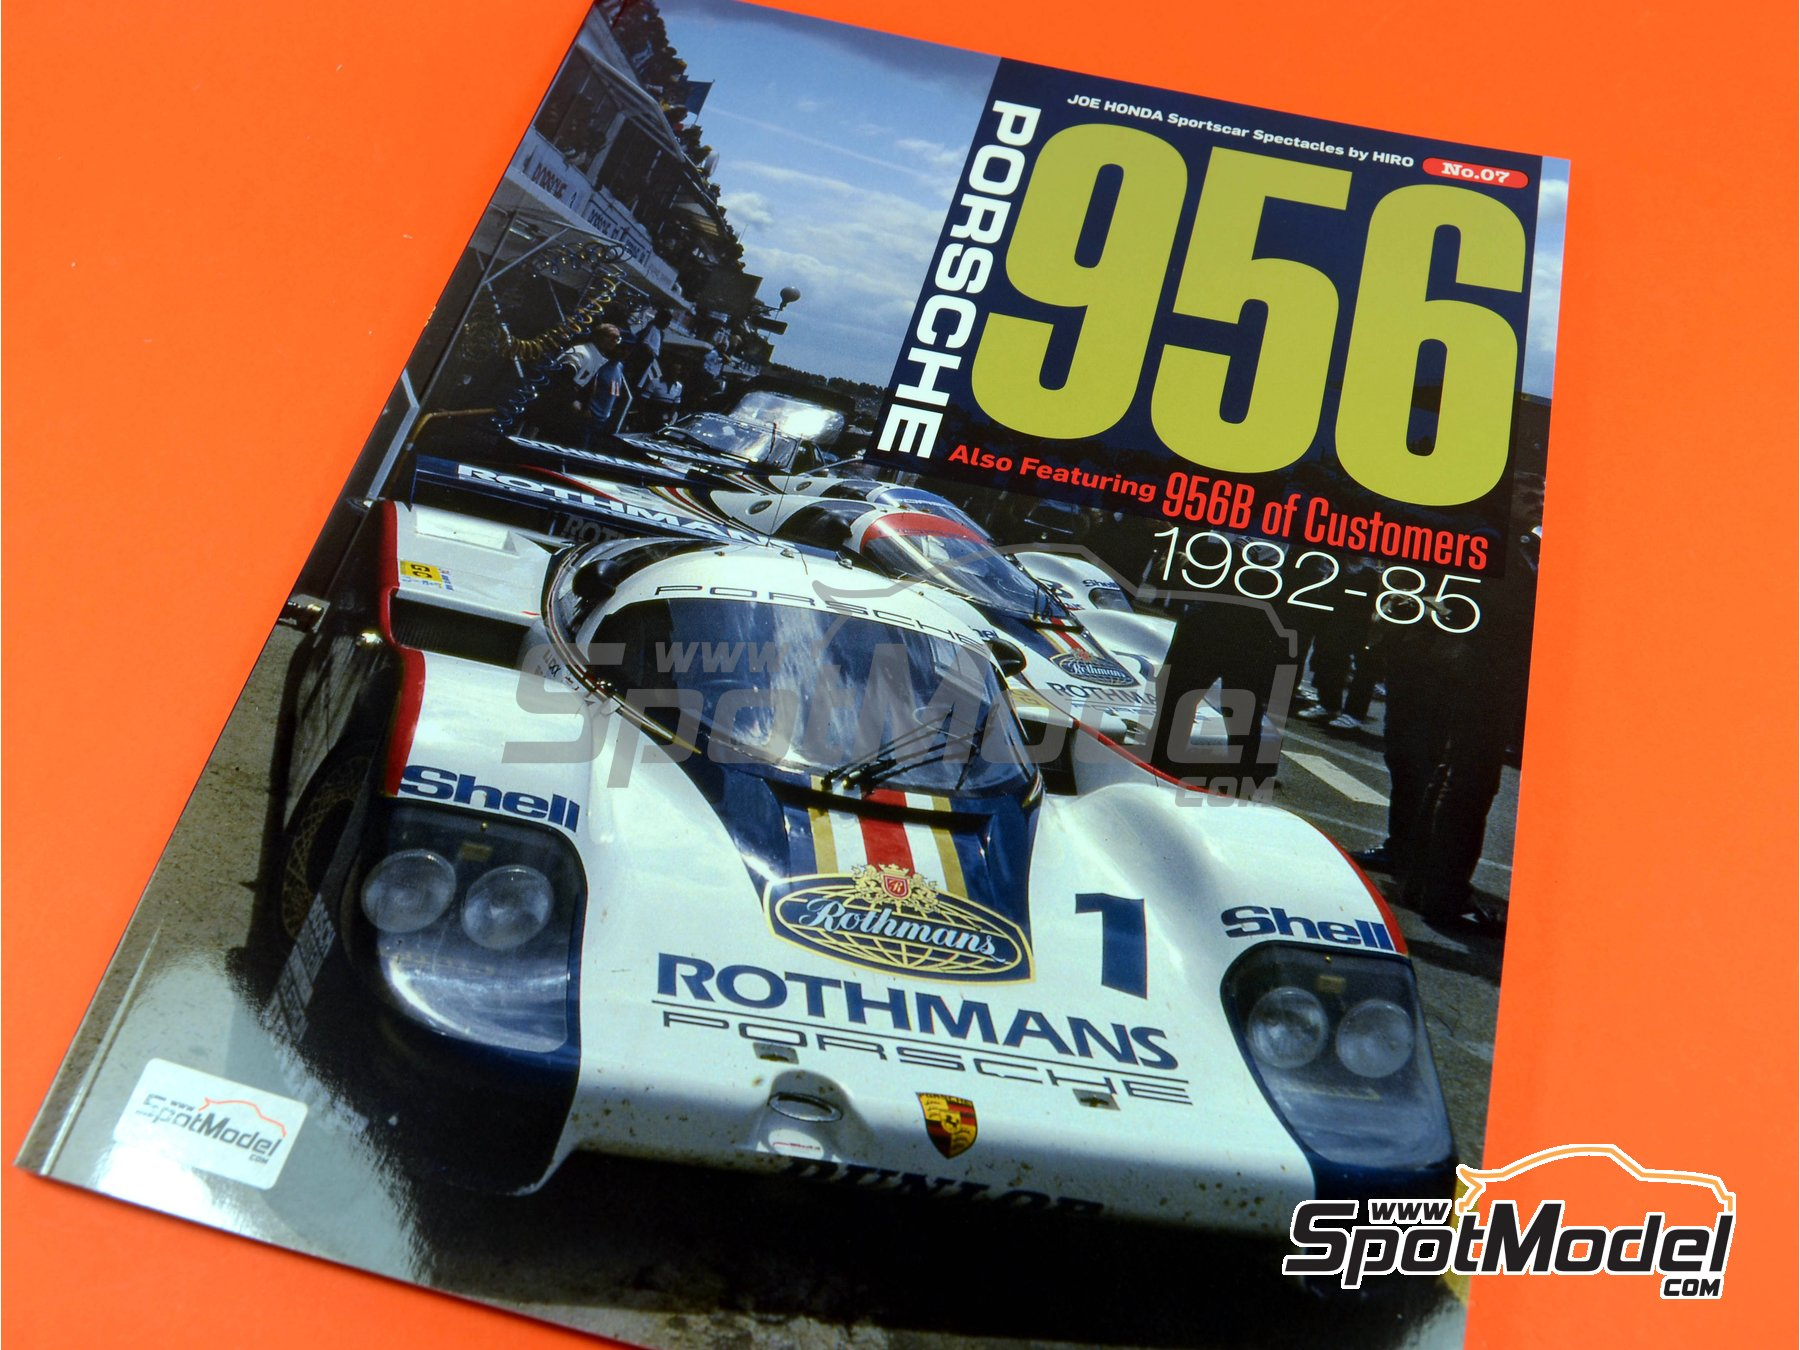 Image 1: Joe Honda Sportscar Spectacles - Porsche 956 - 24 Horas de Le Mans, 1000 Kilómetros de Suzuka, 6 Horas de Silverstone, 6 Horas de Fuji 1982, 1983, 1984, 1985 y 1985 | Libro de referencia fabricado por Model Factory Hiro (ref.MFH-SS007)